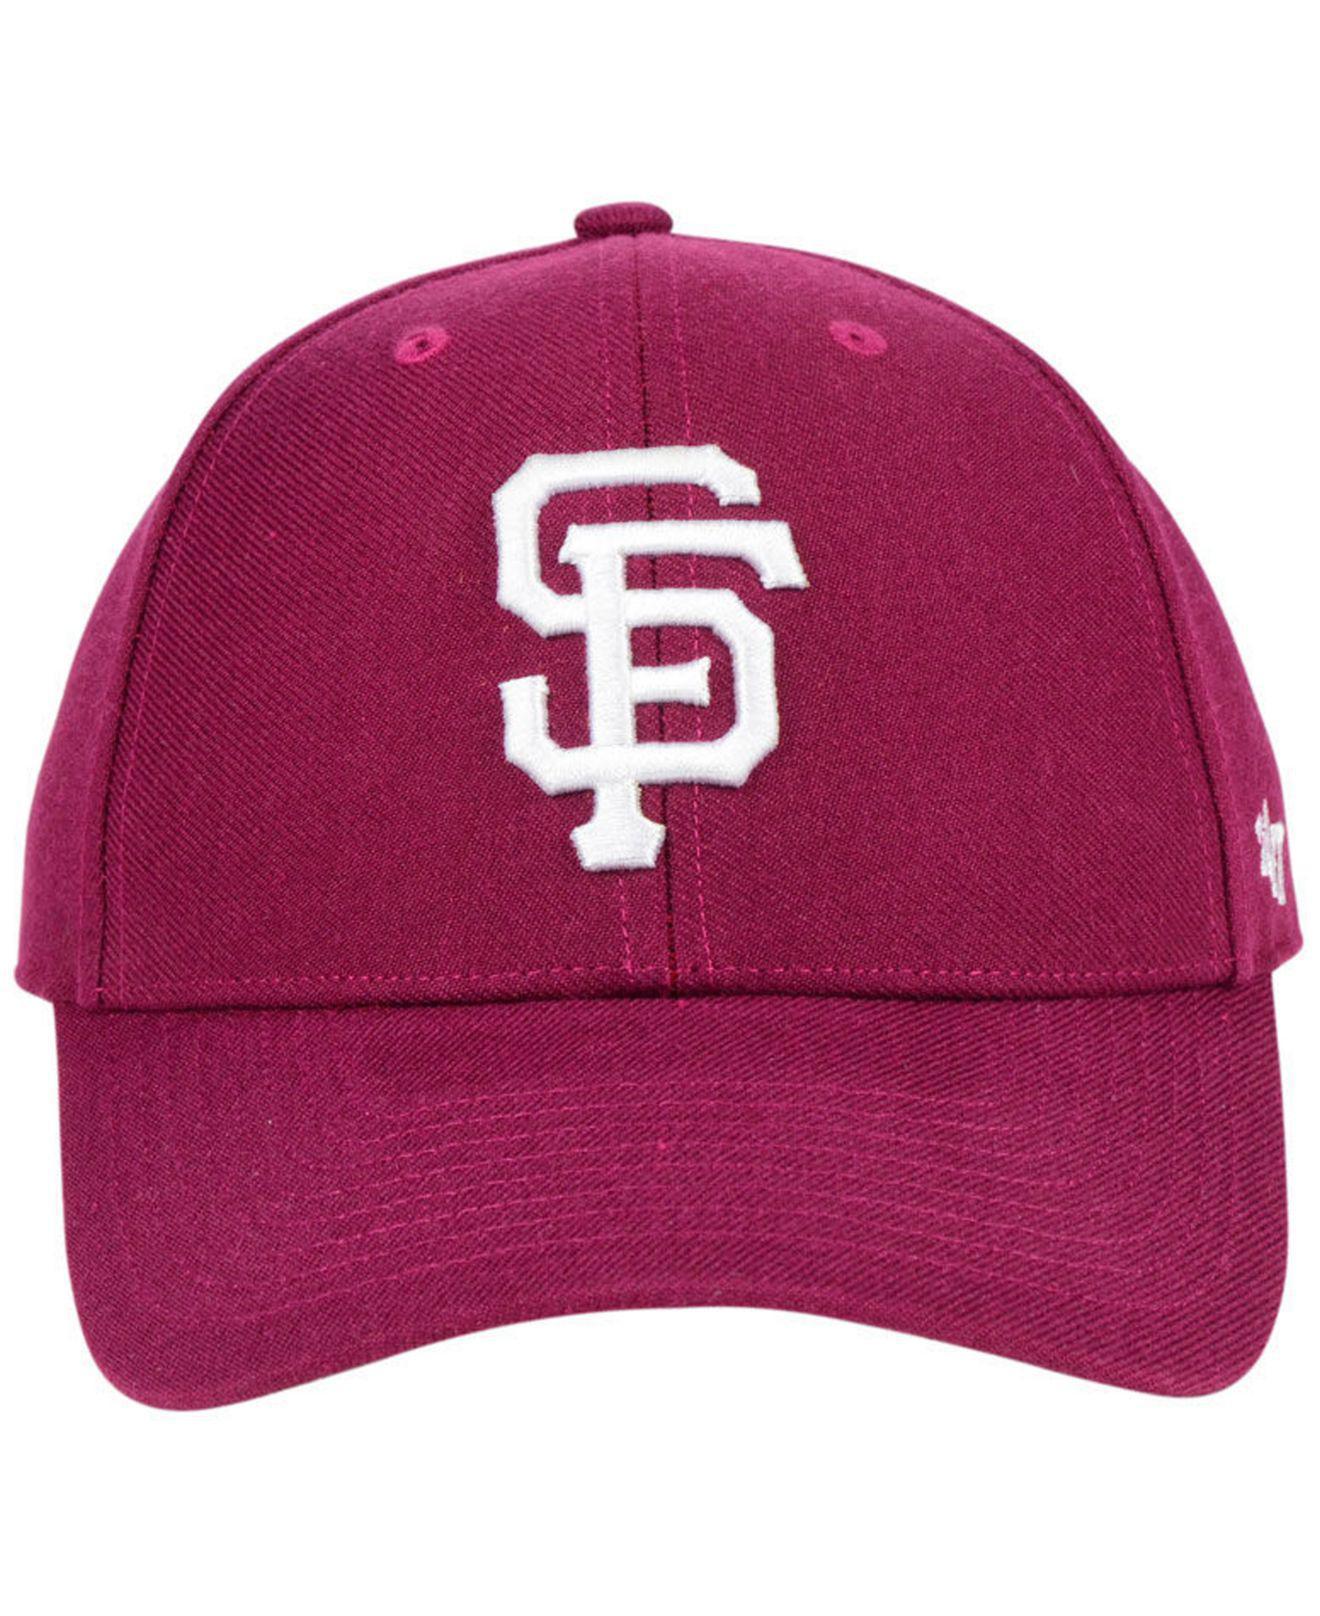 Inspired By San Francisco Giants San Francisco Giants Felt Cufflinks